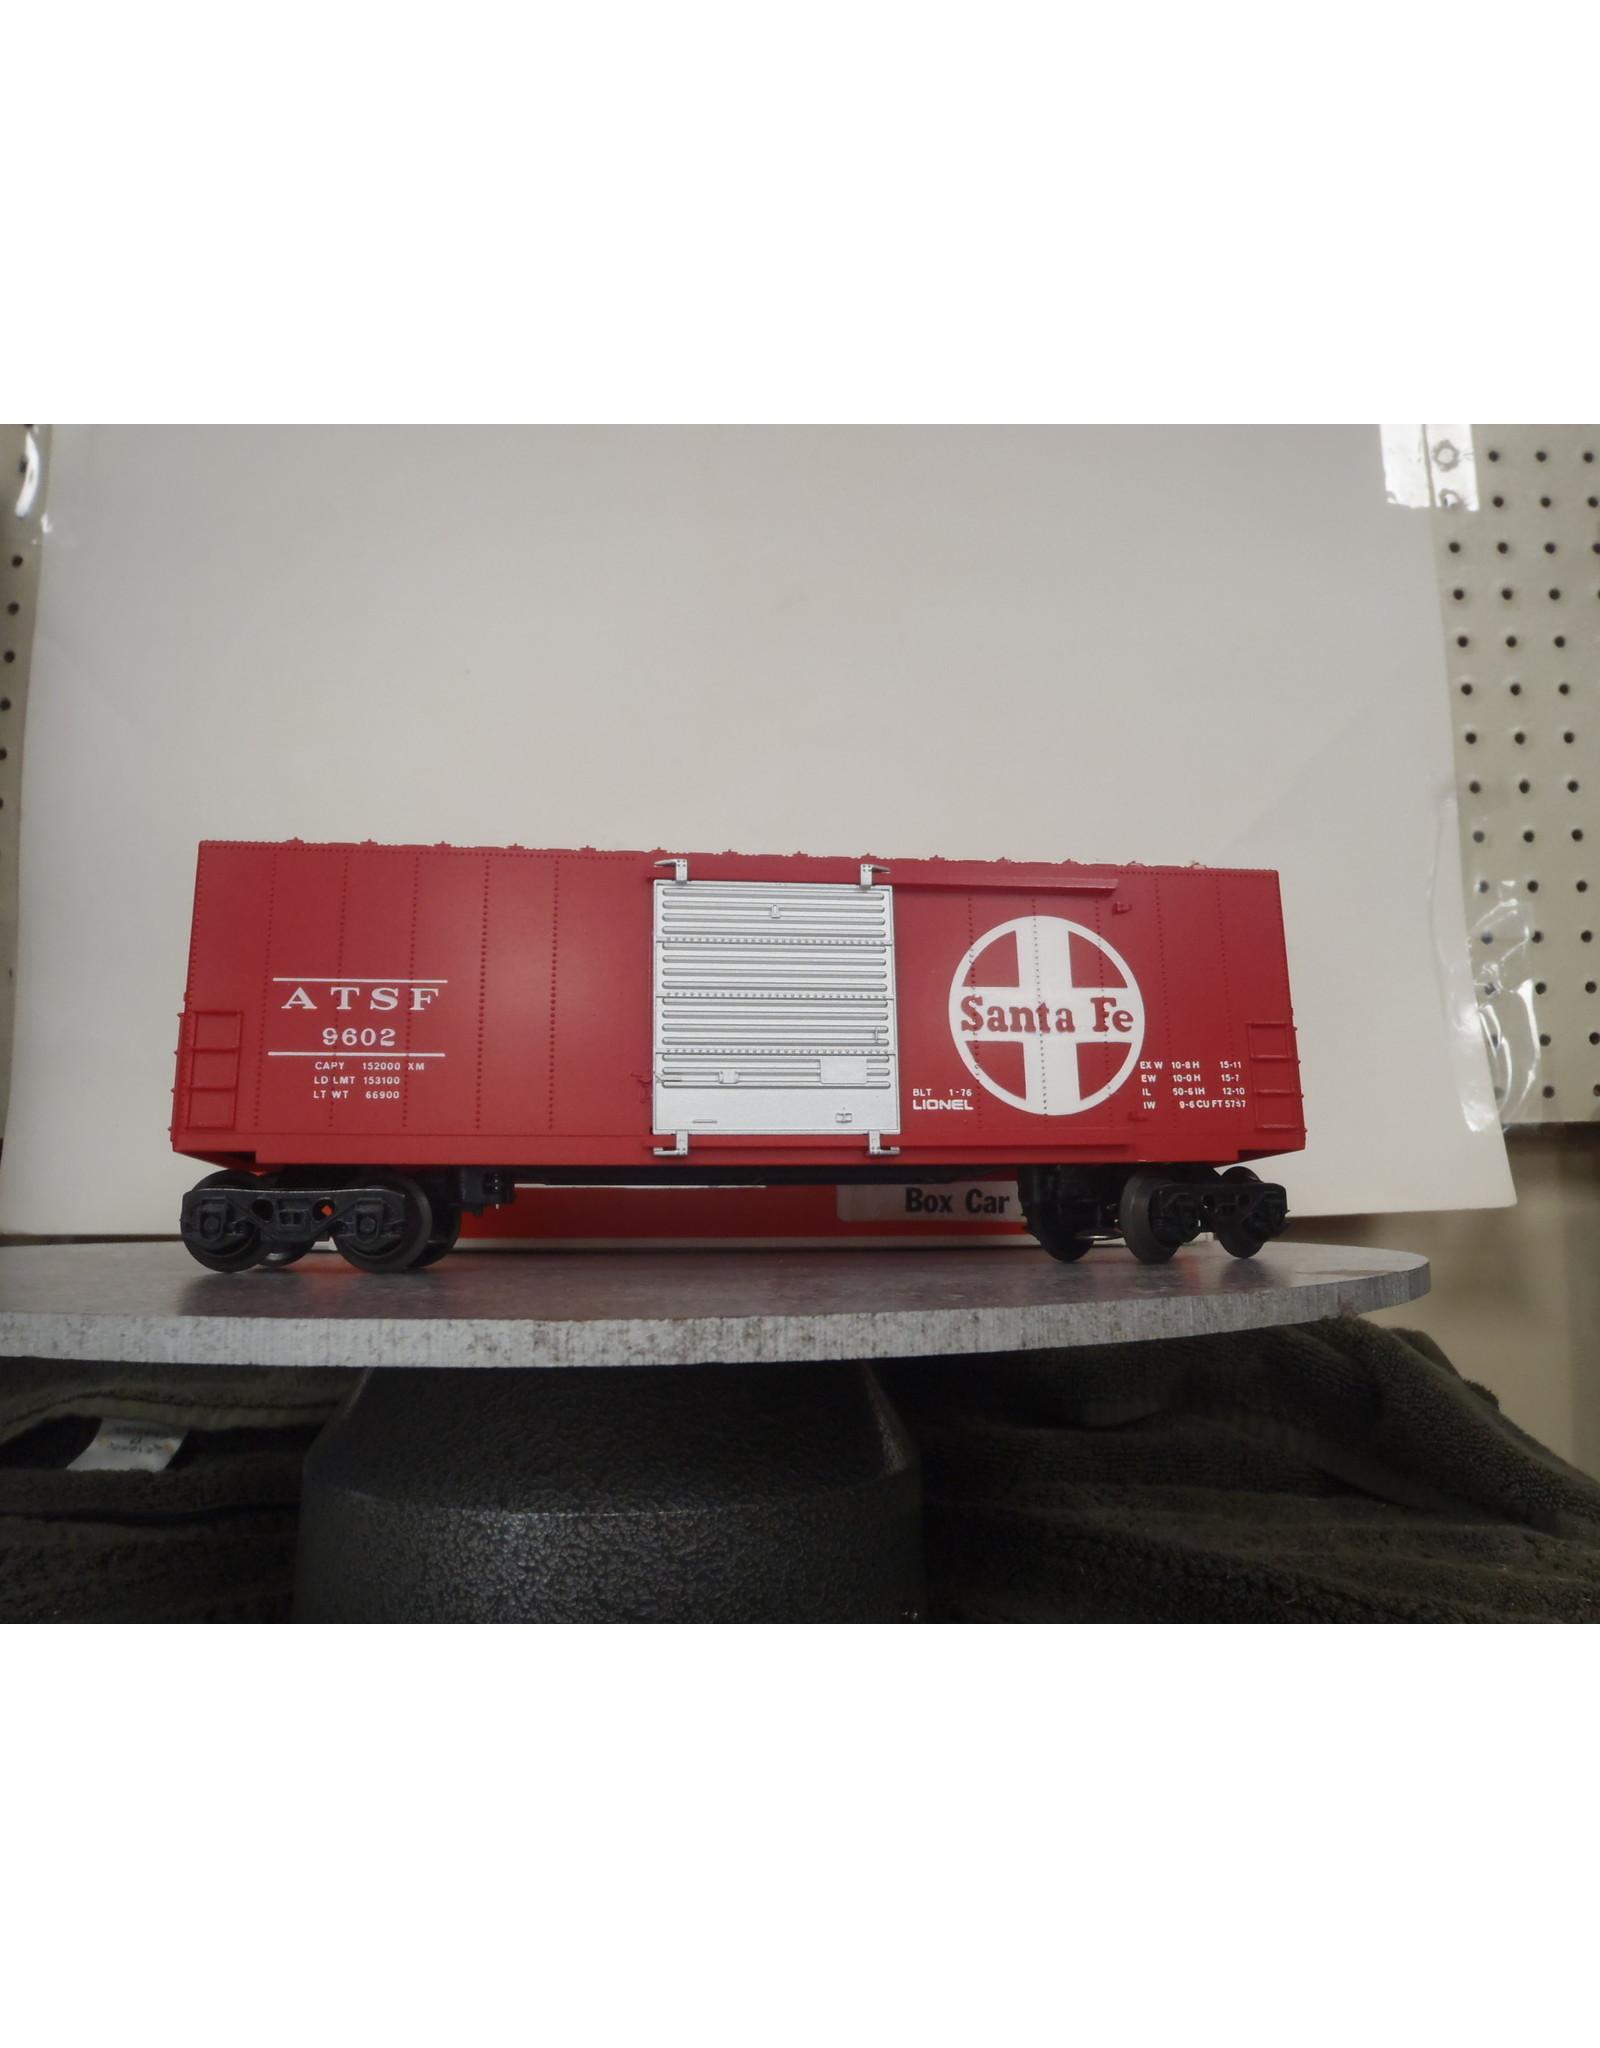 Lionel Boxcar Hi-Cube Sante Fe 9602